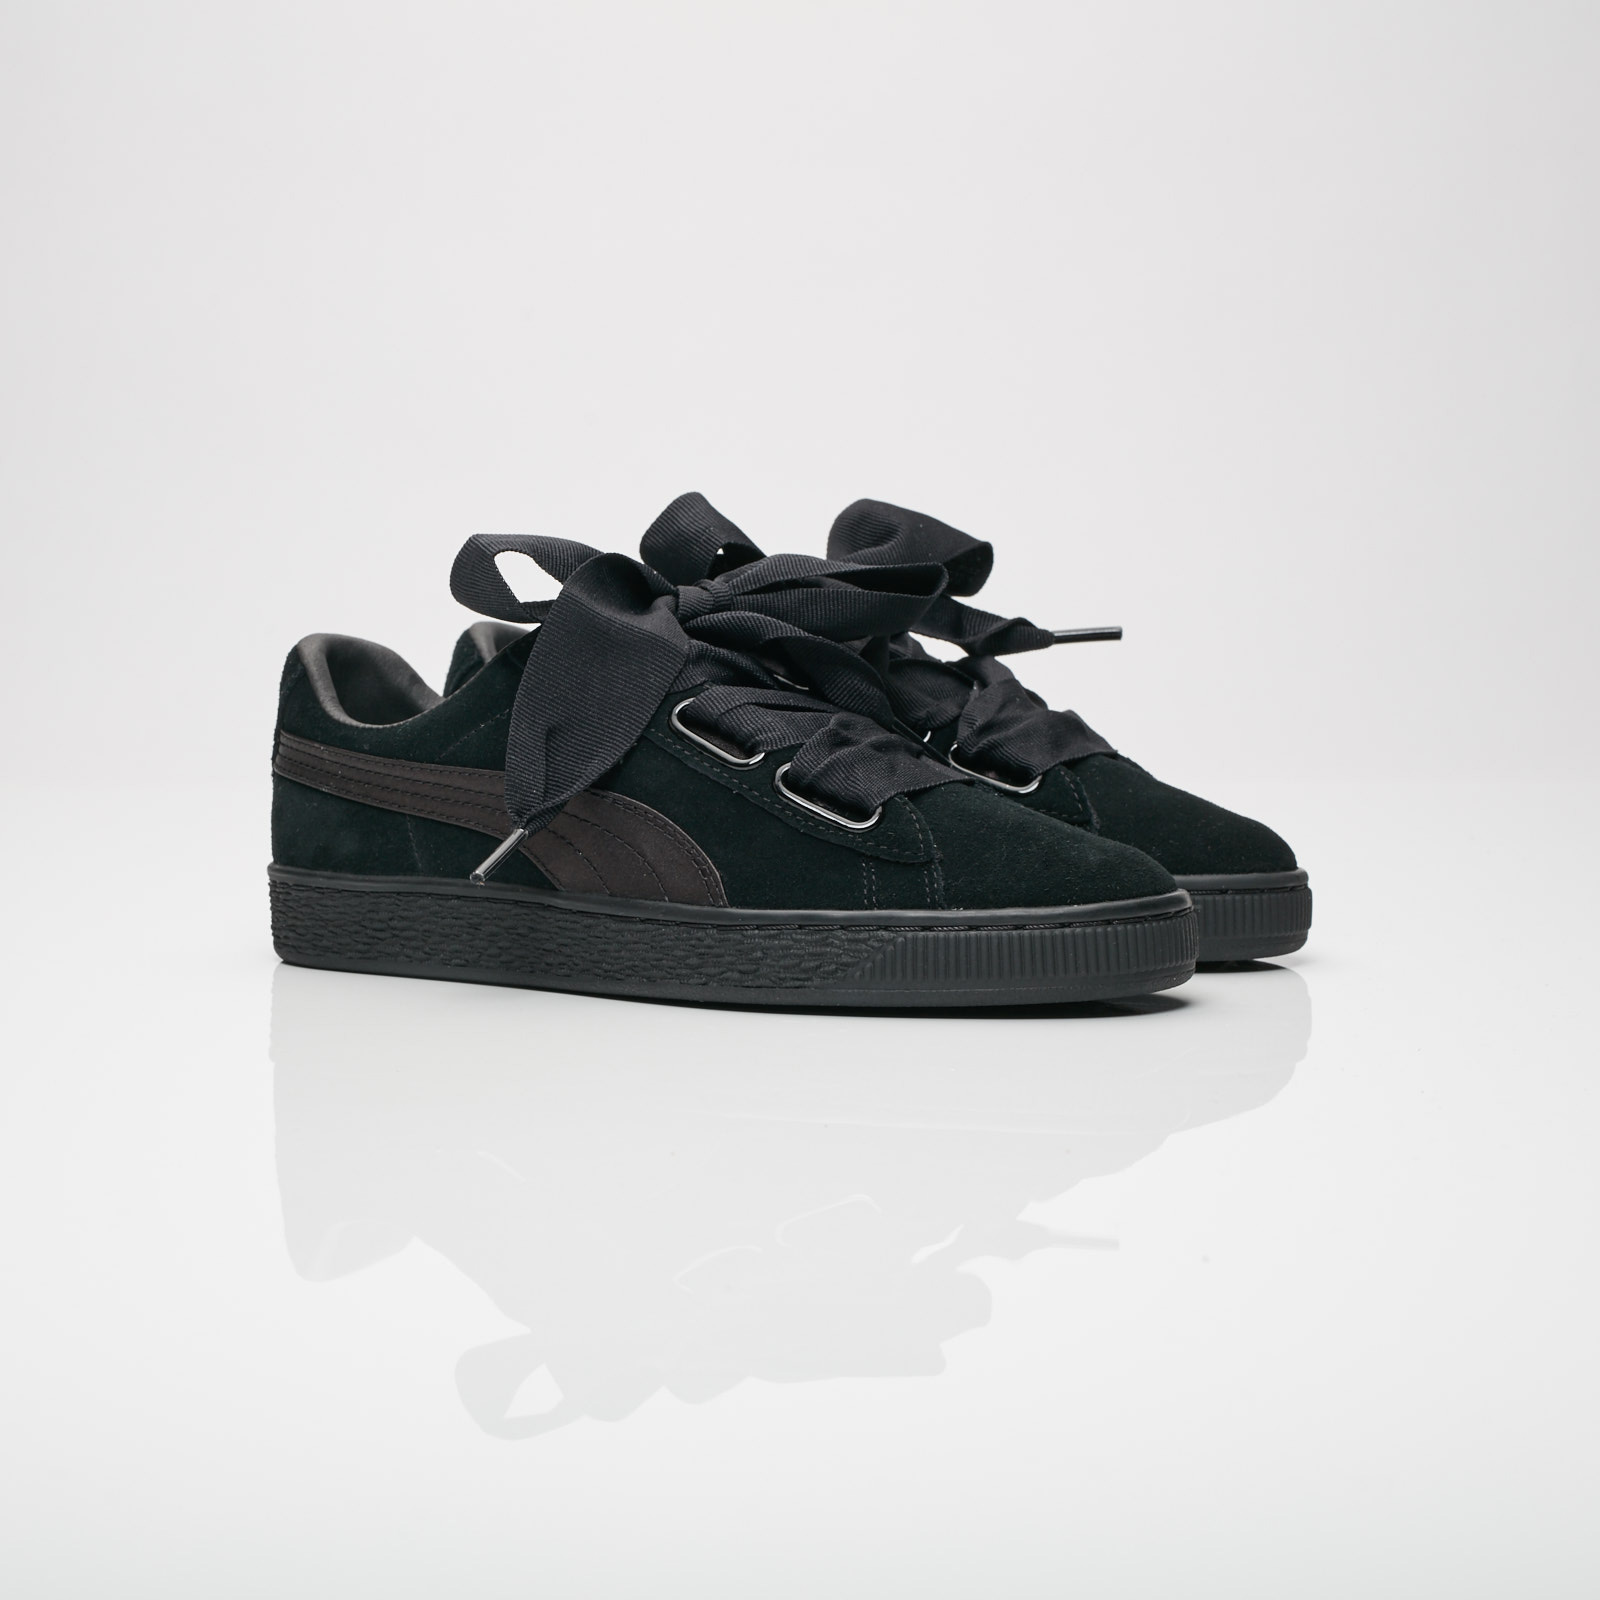 online store d217c 6e04c Puma Suede Heart EP WNS - 366922-01 - Sneakersnstuff ...